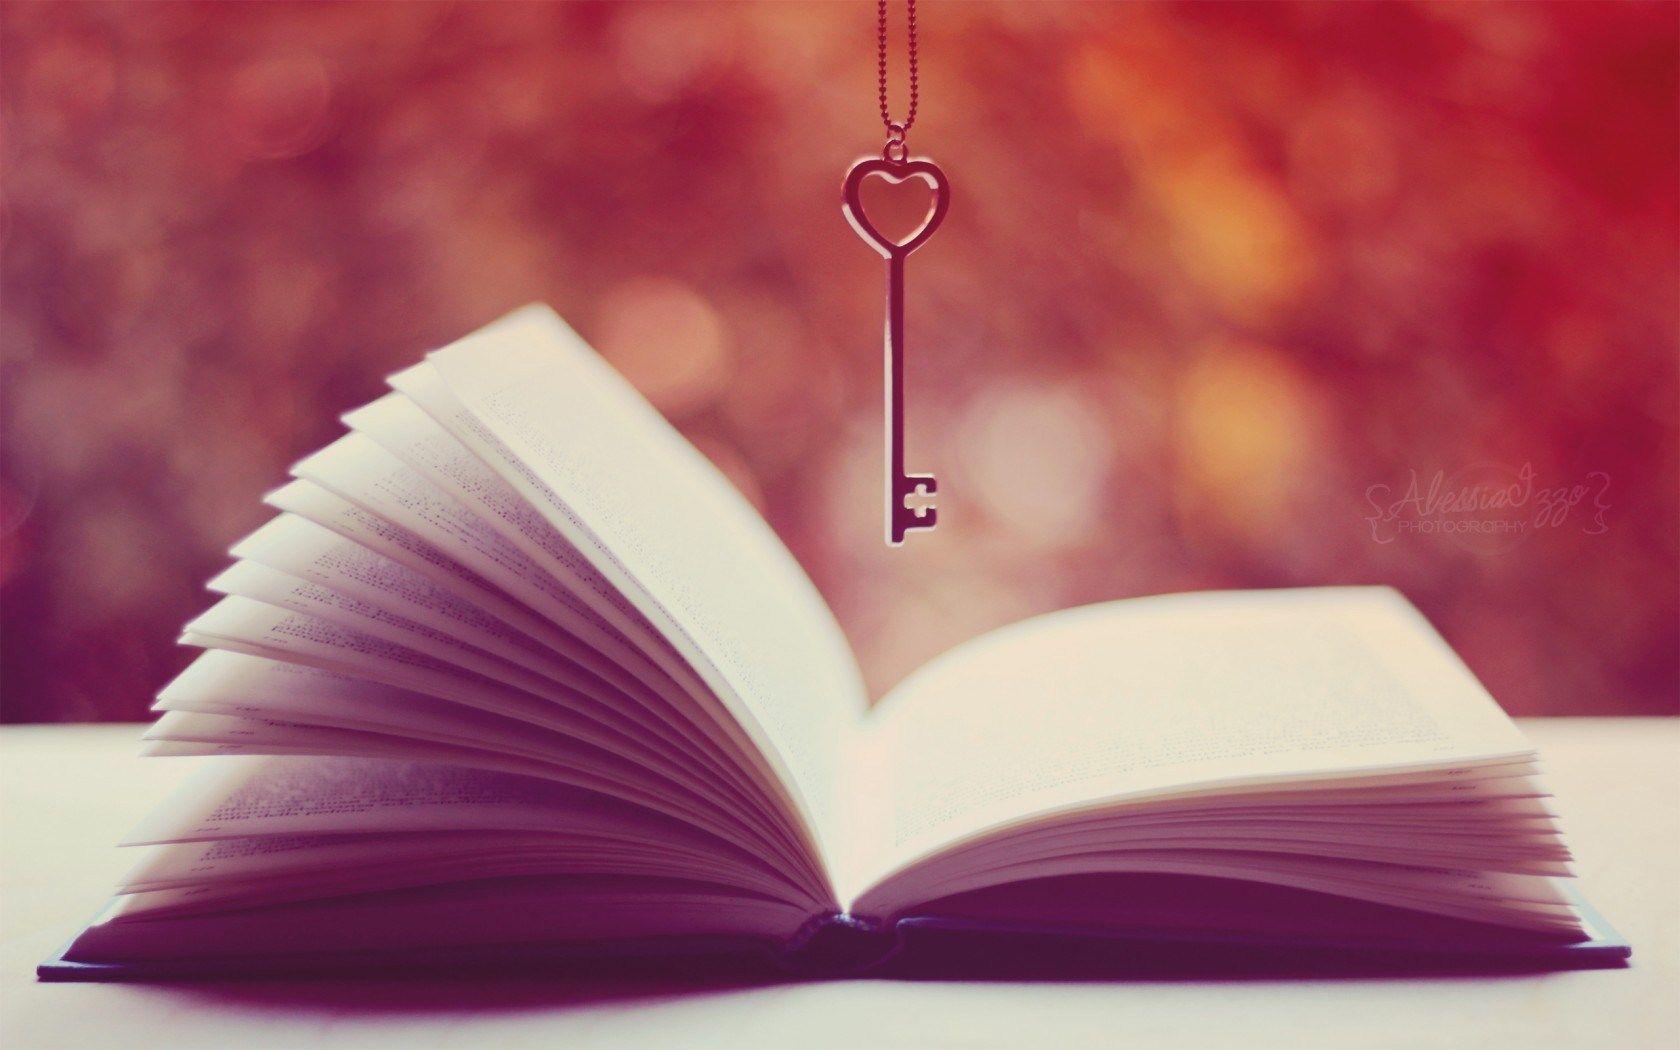 key book photo hd wallpaper - freehdwalls | wallpapers | pinterest